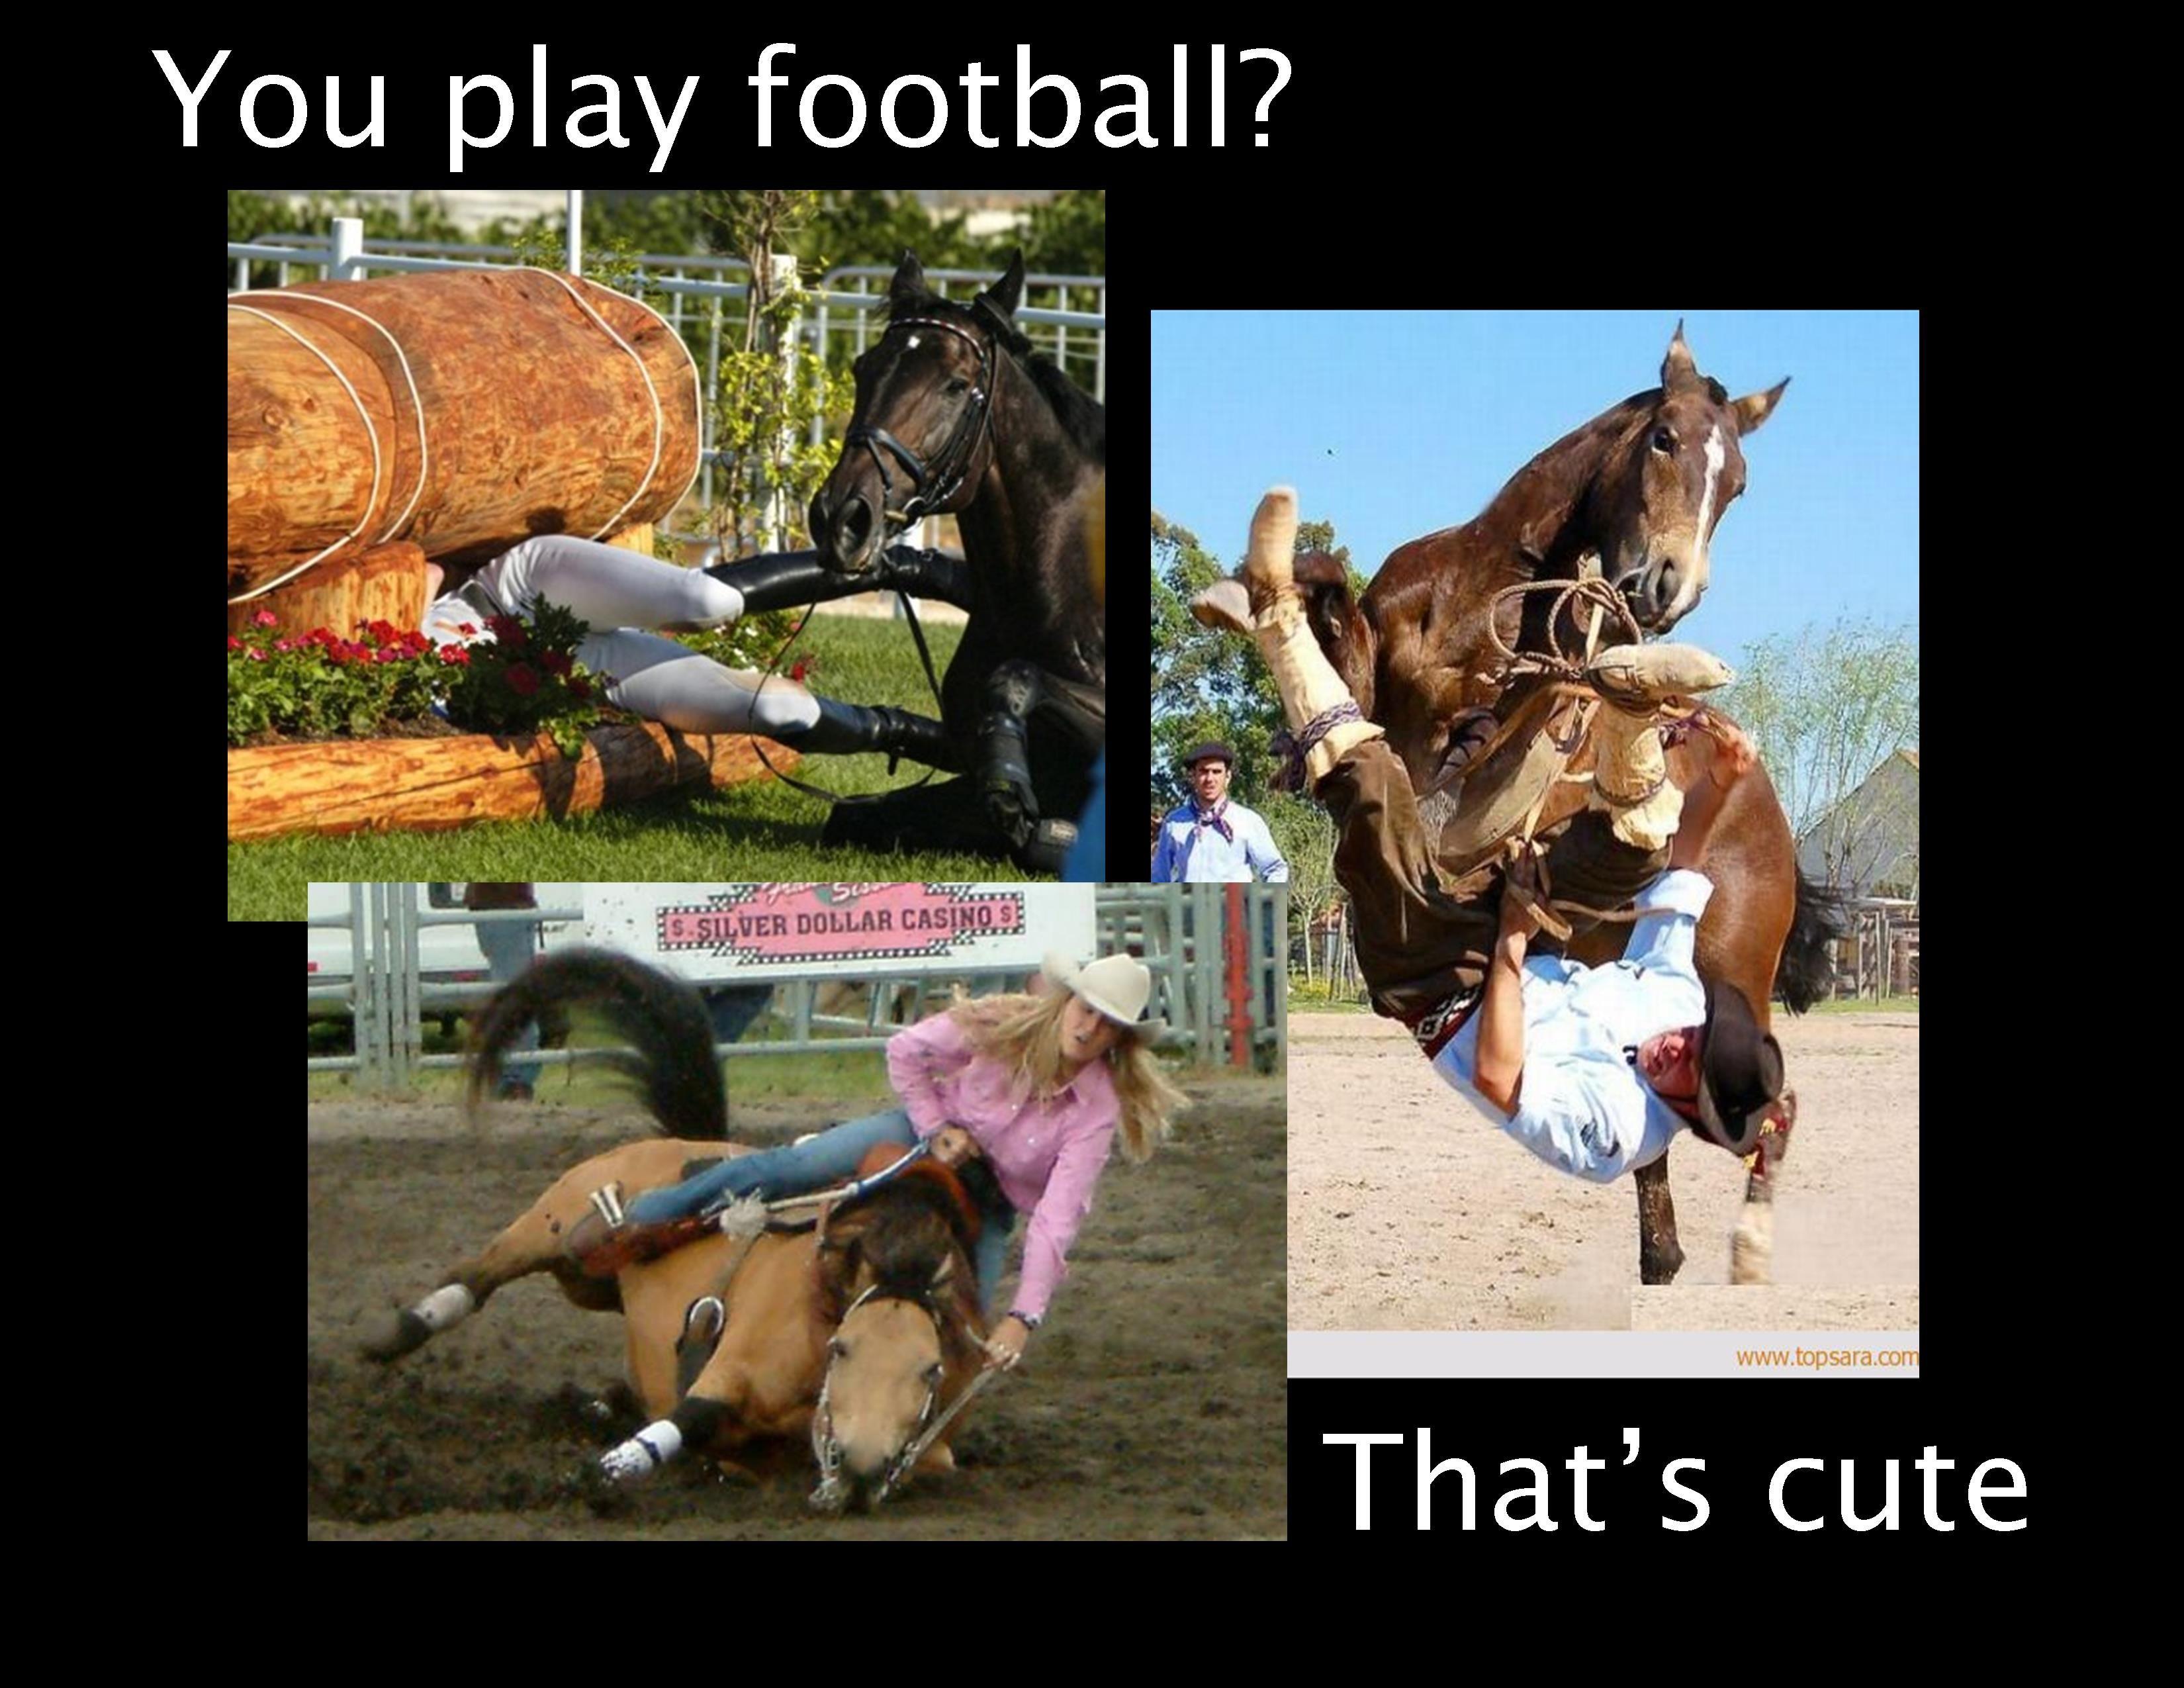 Pics photos quote i wrote for my horse com account s equestrian - Explore Horse Quotes Horseback Riding And More